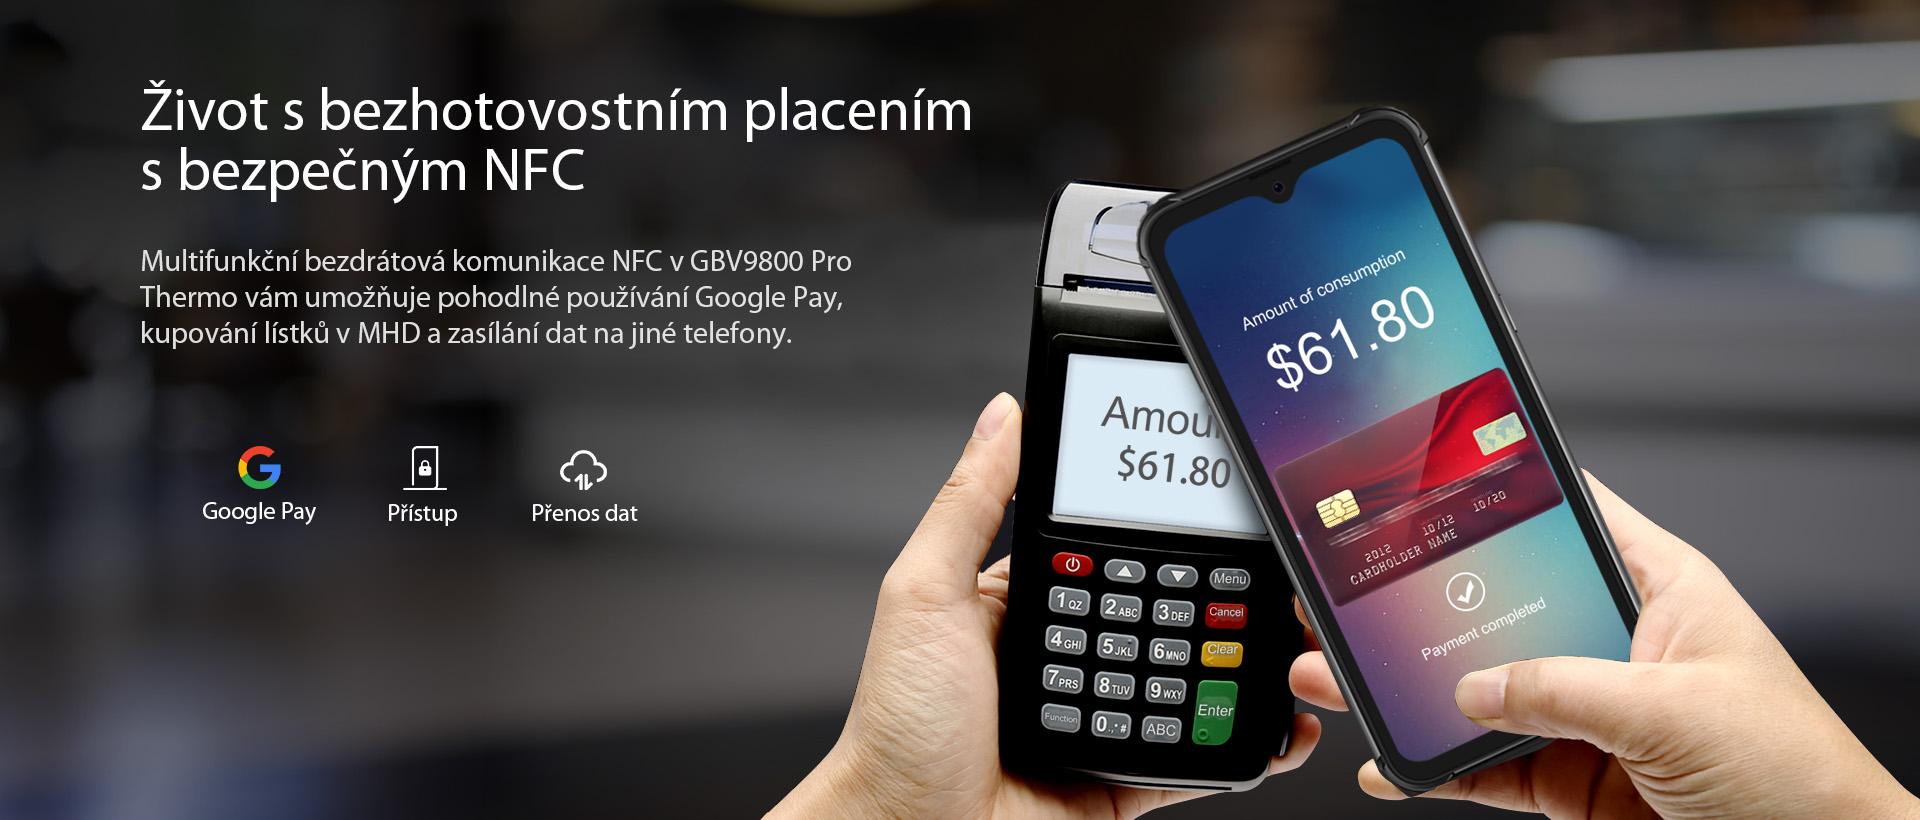 gbv9800-pro-nfc